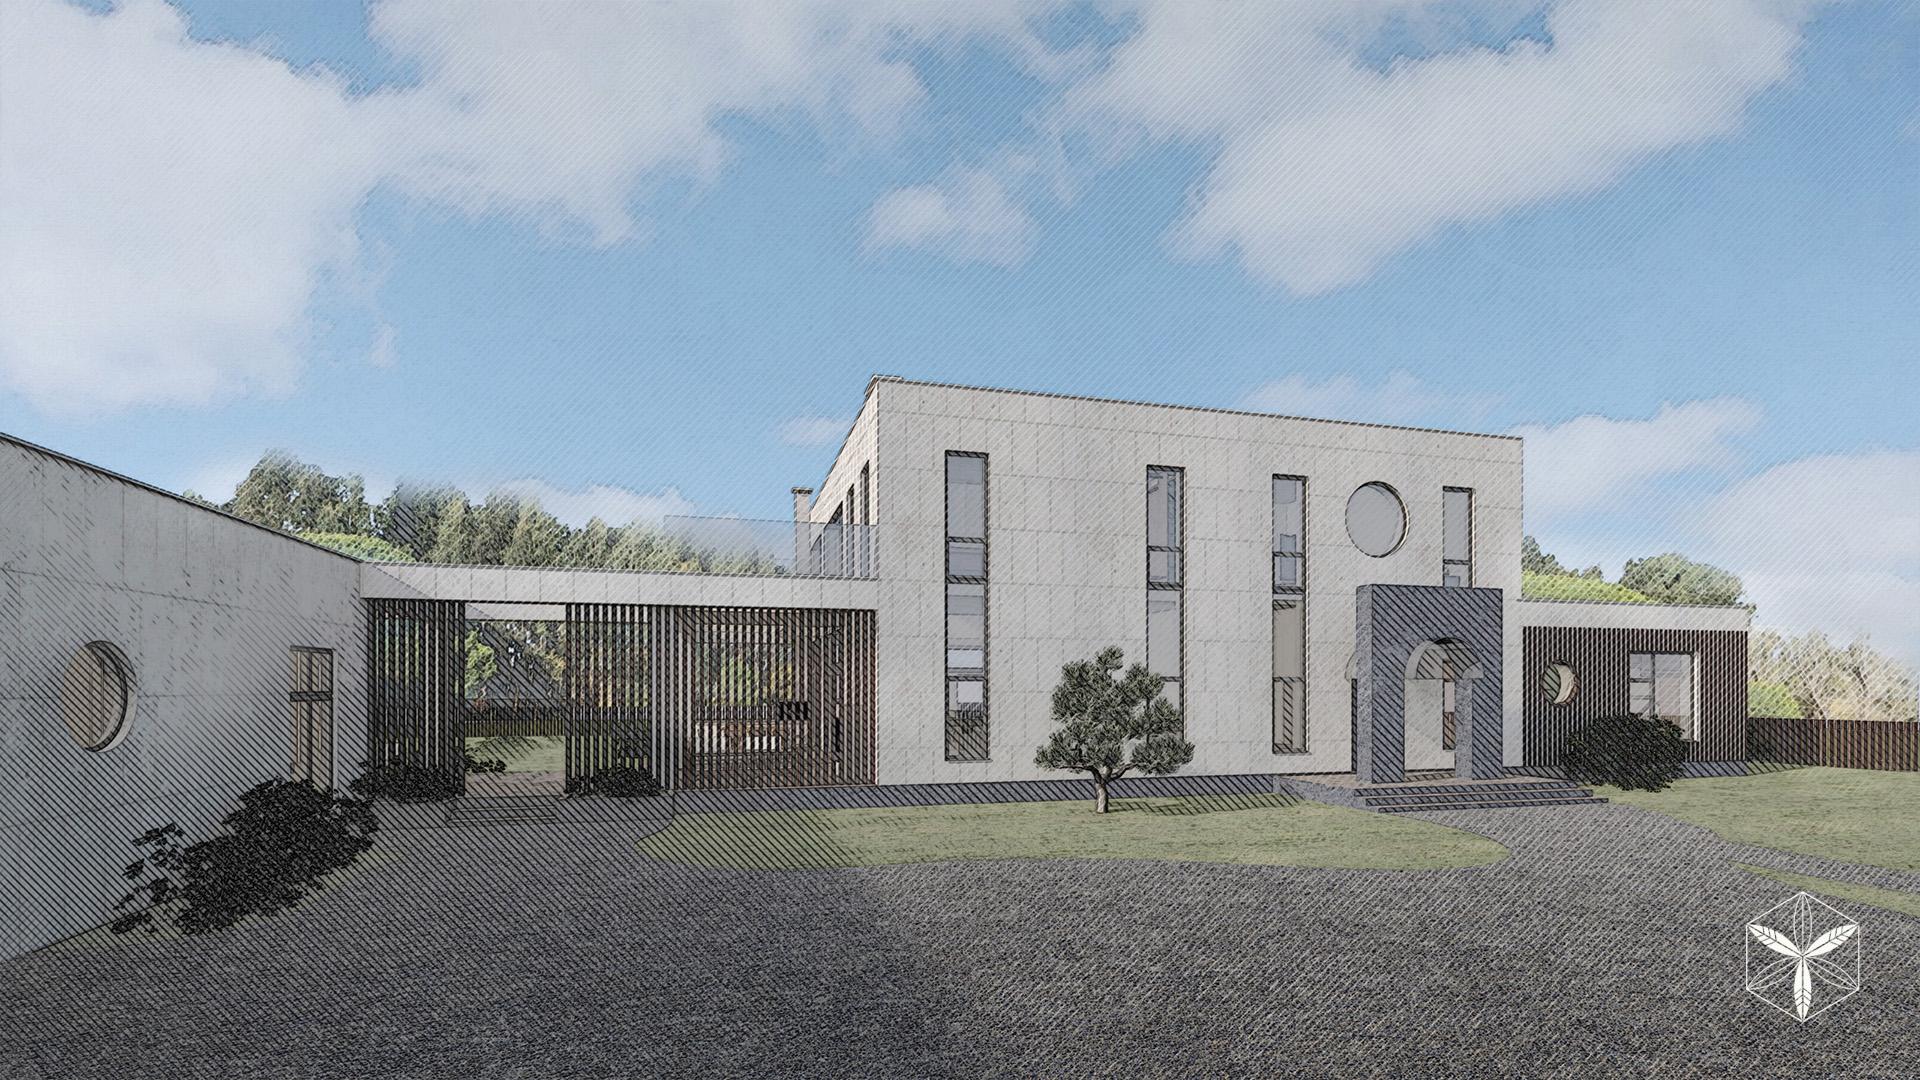 Изображение для проекта Проект особняка в Латвии в стиле модерн 2881